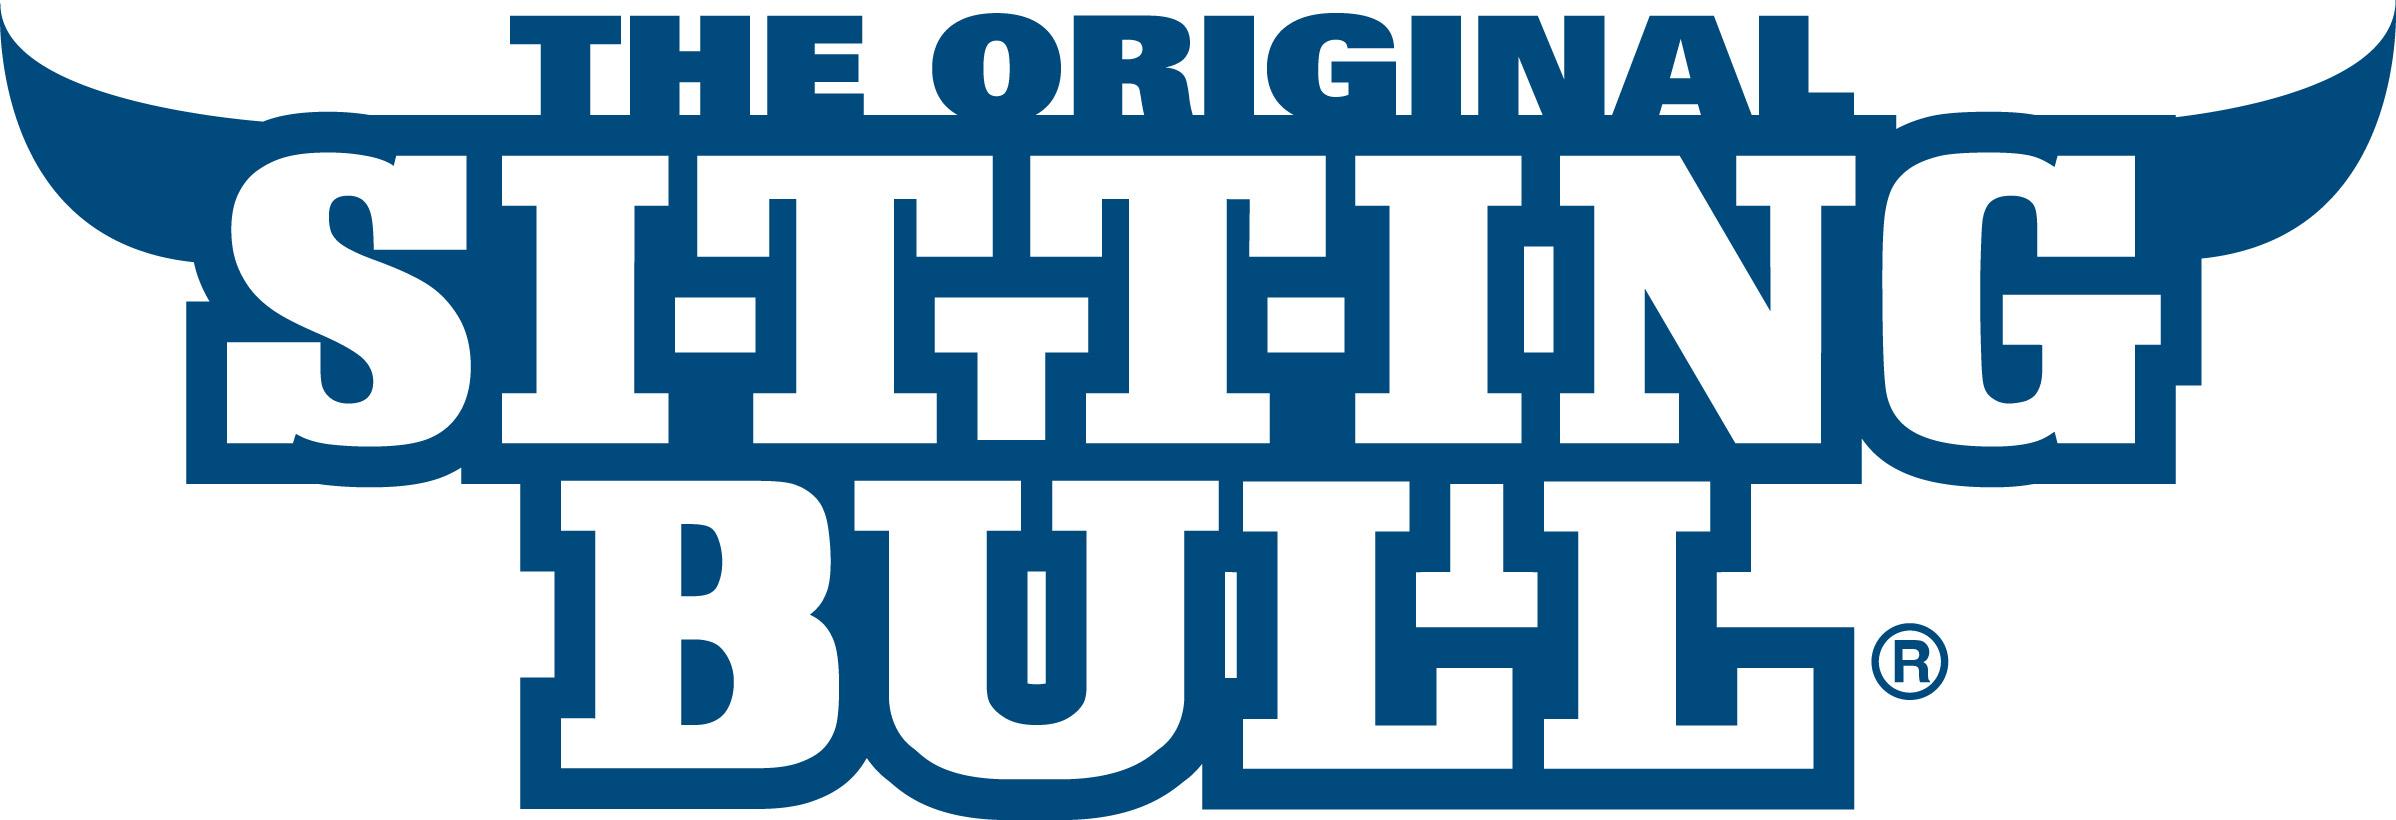 The Original Sitting Bull